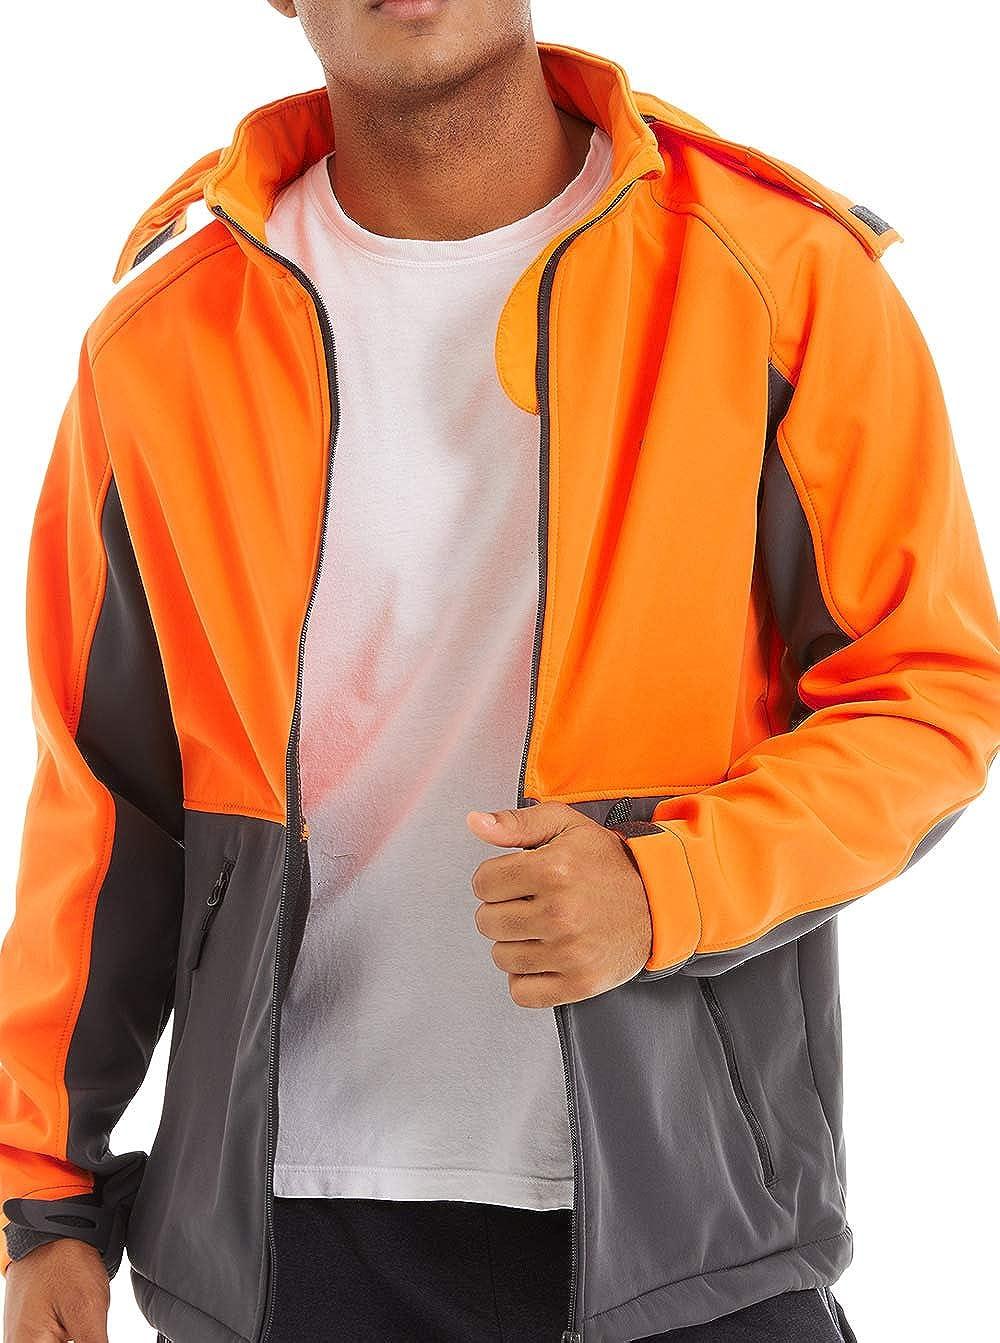 TACVASEN Mens Fleece Jacket Windproof Outdoor Jackets Waterproof Softshell Jacket with Hood Tactical Military Jackets